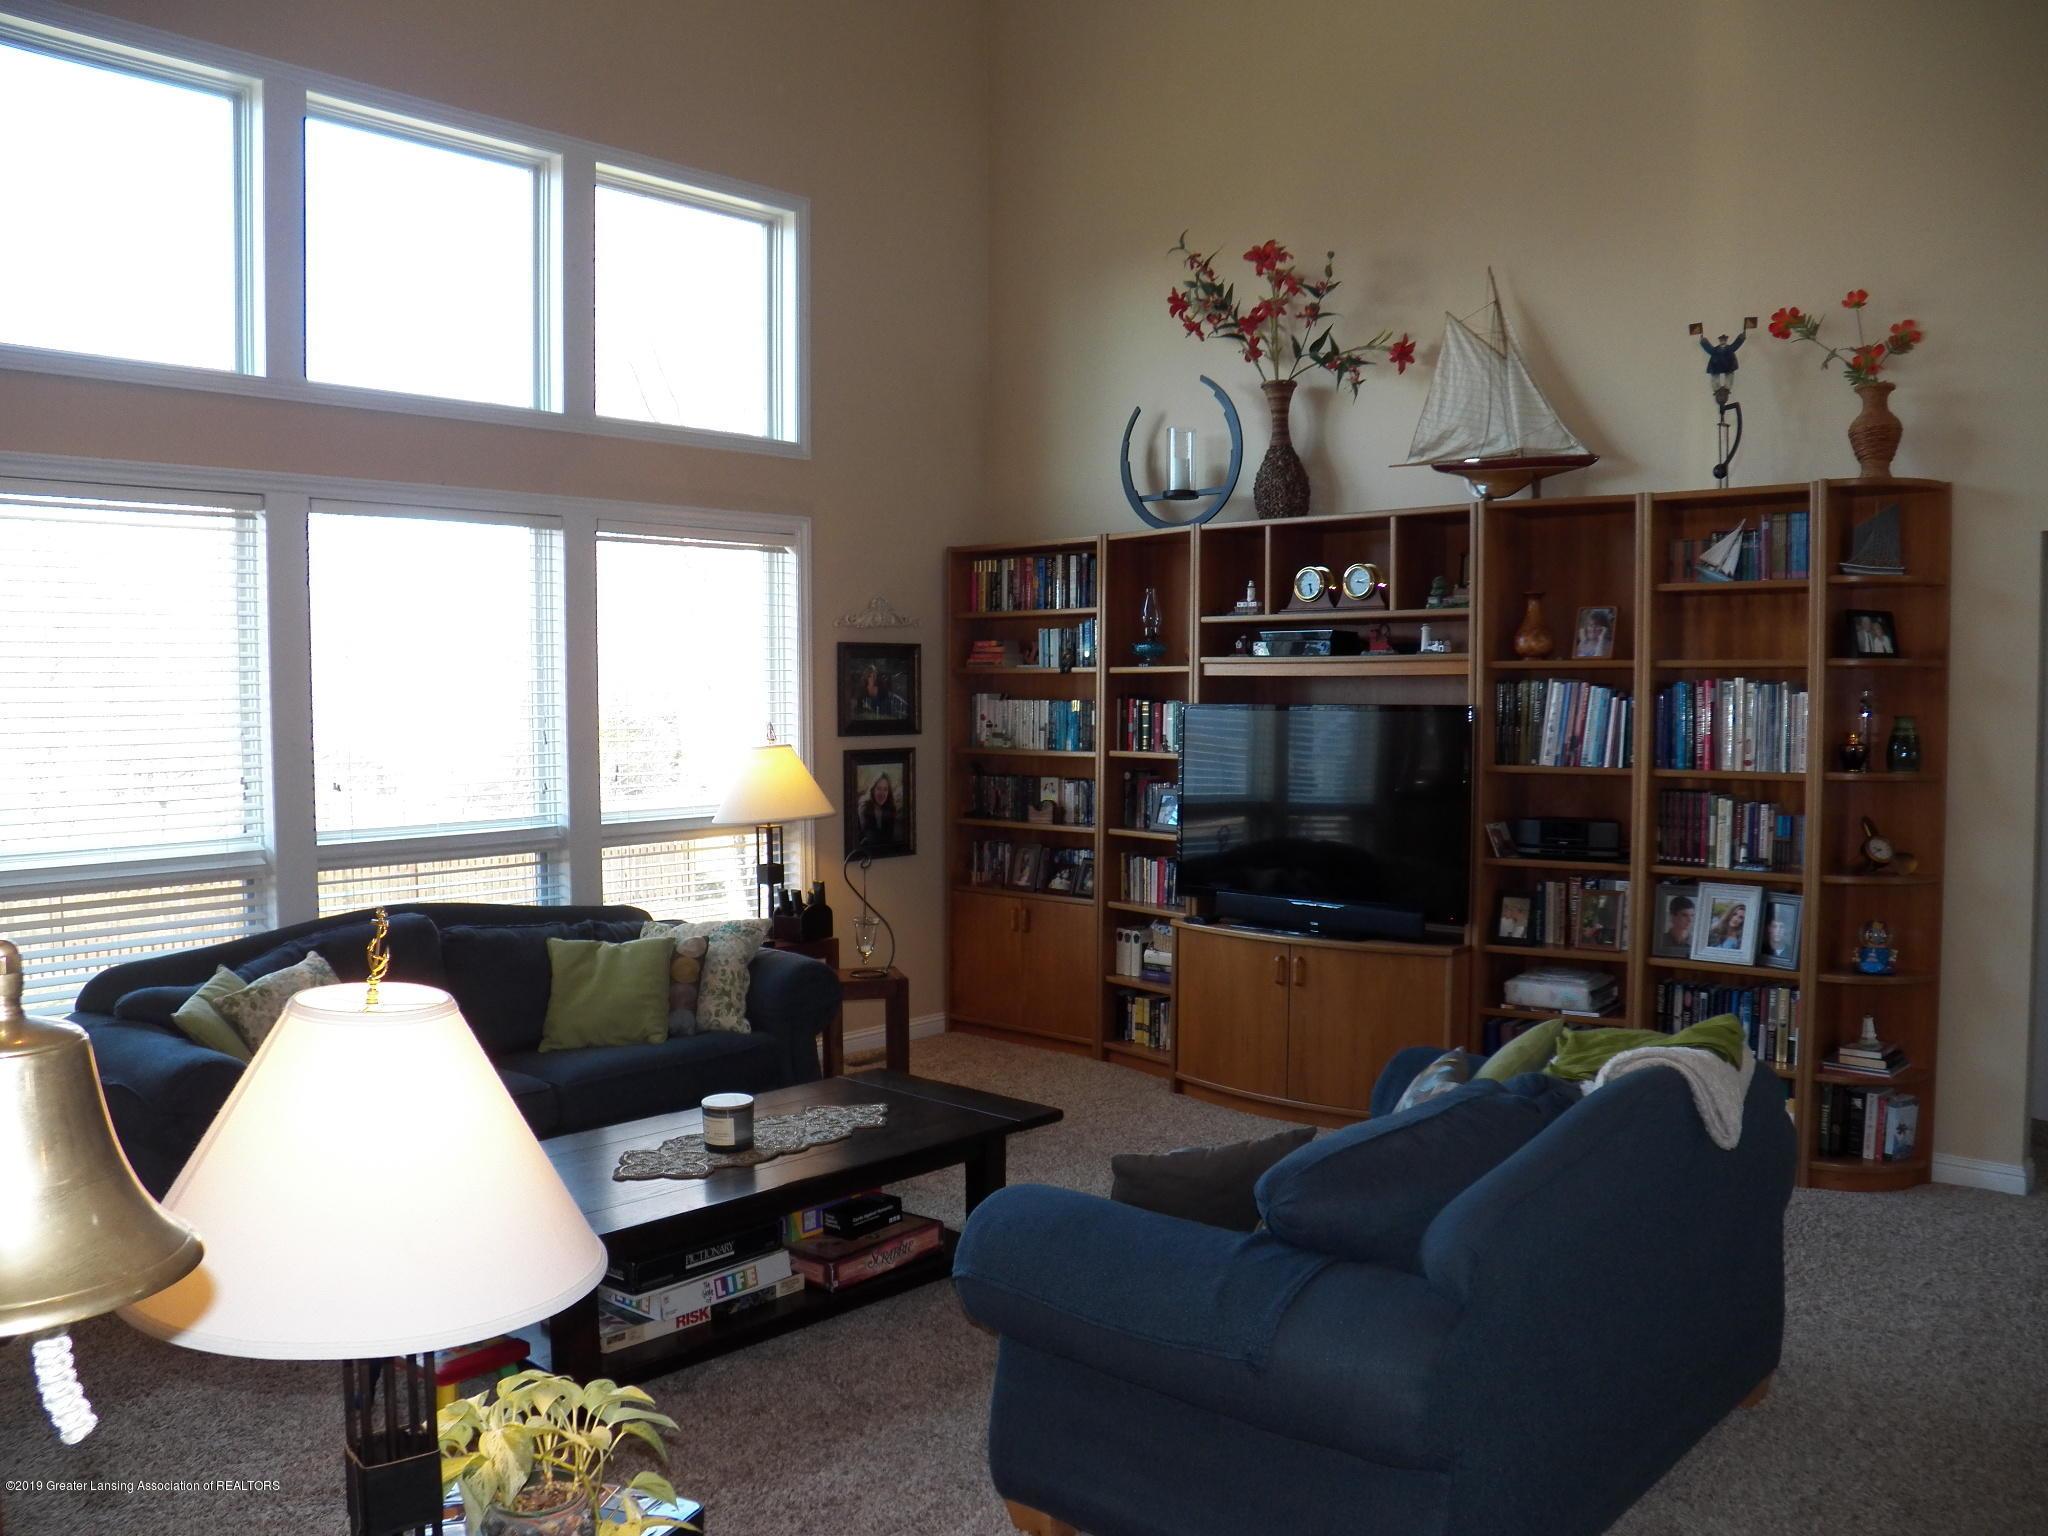 7387 Mallow Ln - living room - 3